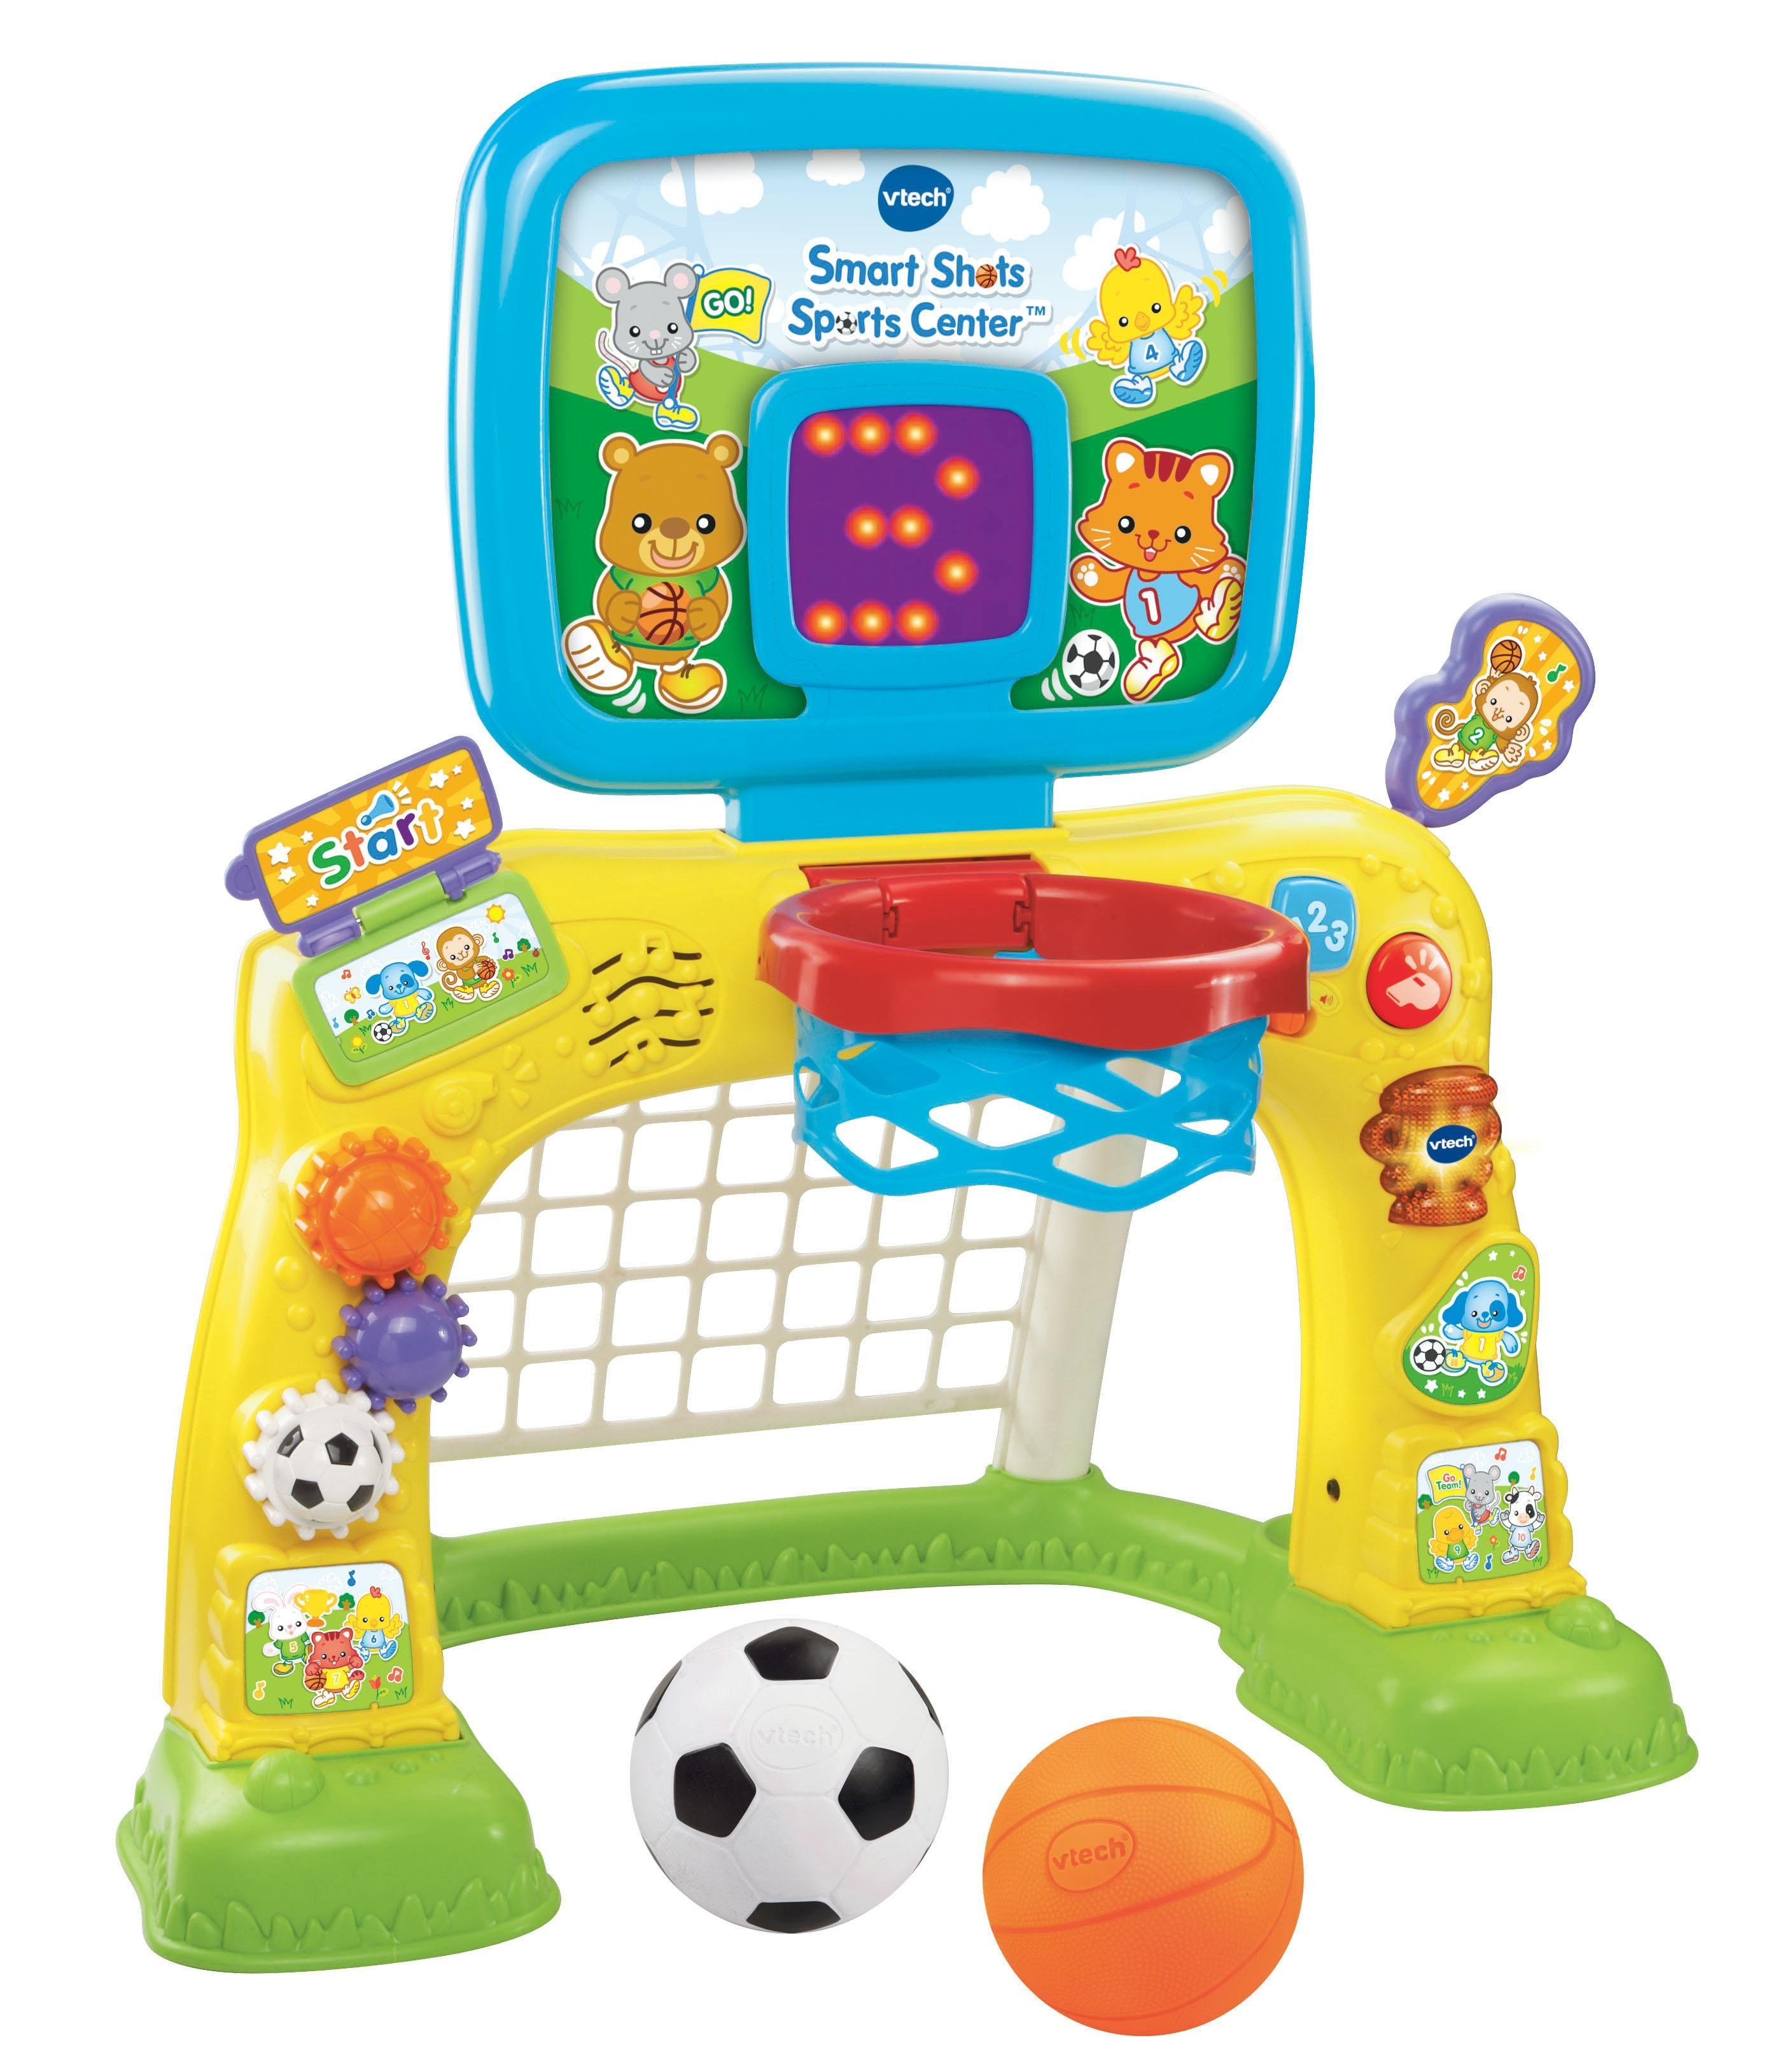 Amazon VTech Smart Shots Sports Center Toys & Games